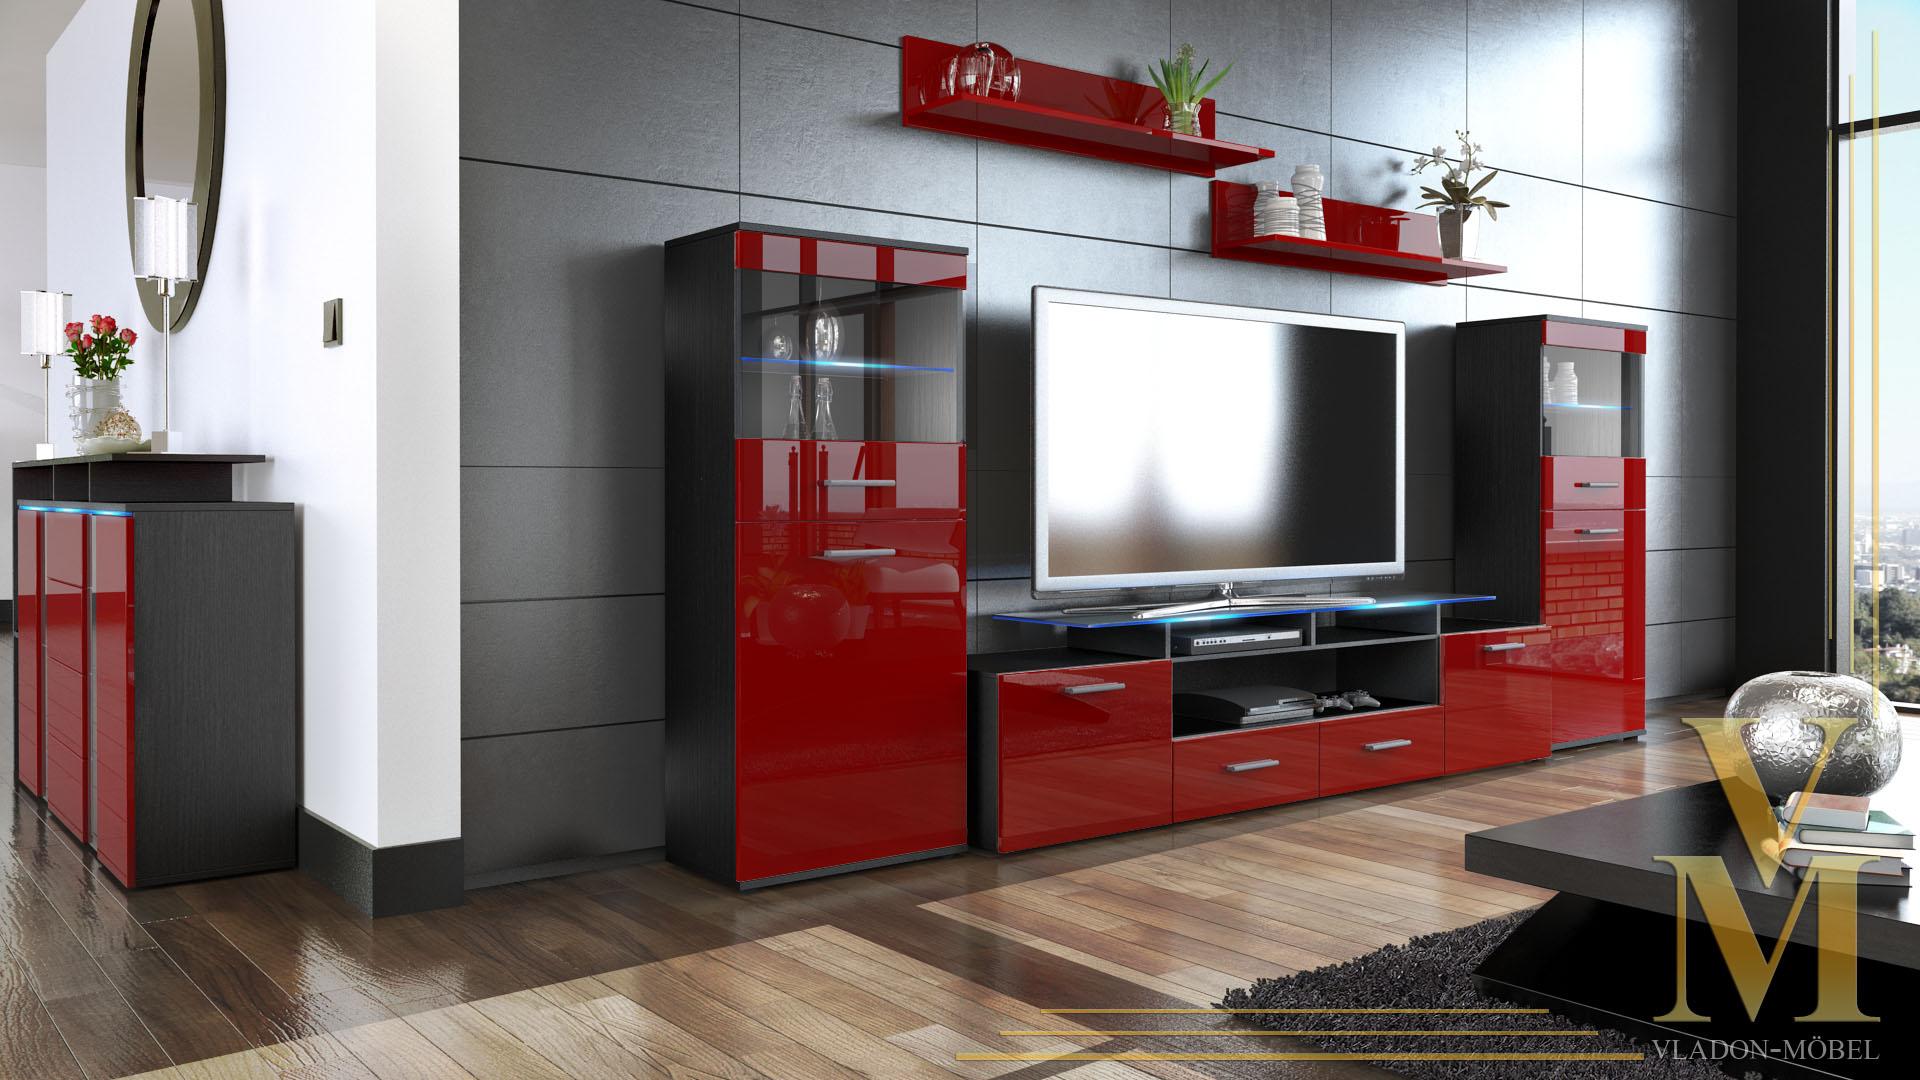 wohnwand anbauwand schrankwand almada v2 in schwarz bordeaux hochglanz ebay. Black Bedroom Furniture Sets. Home Design Ideas